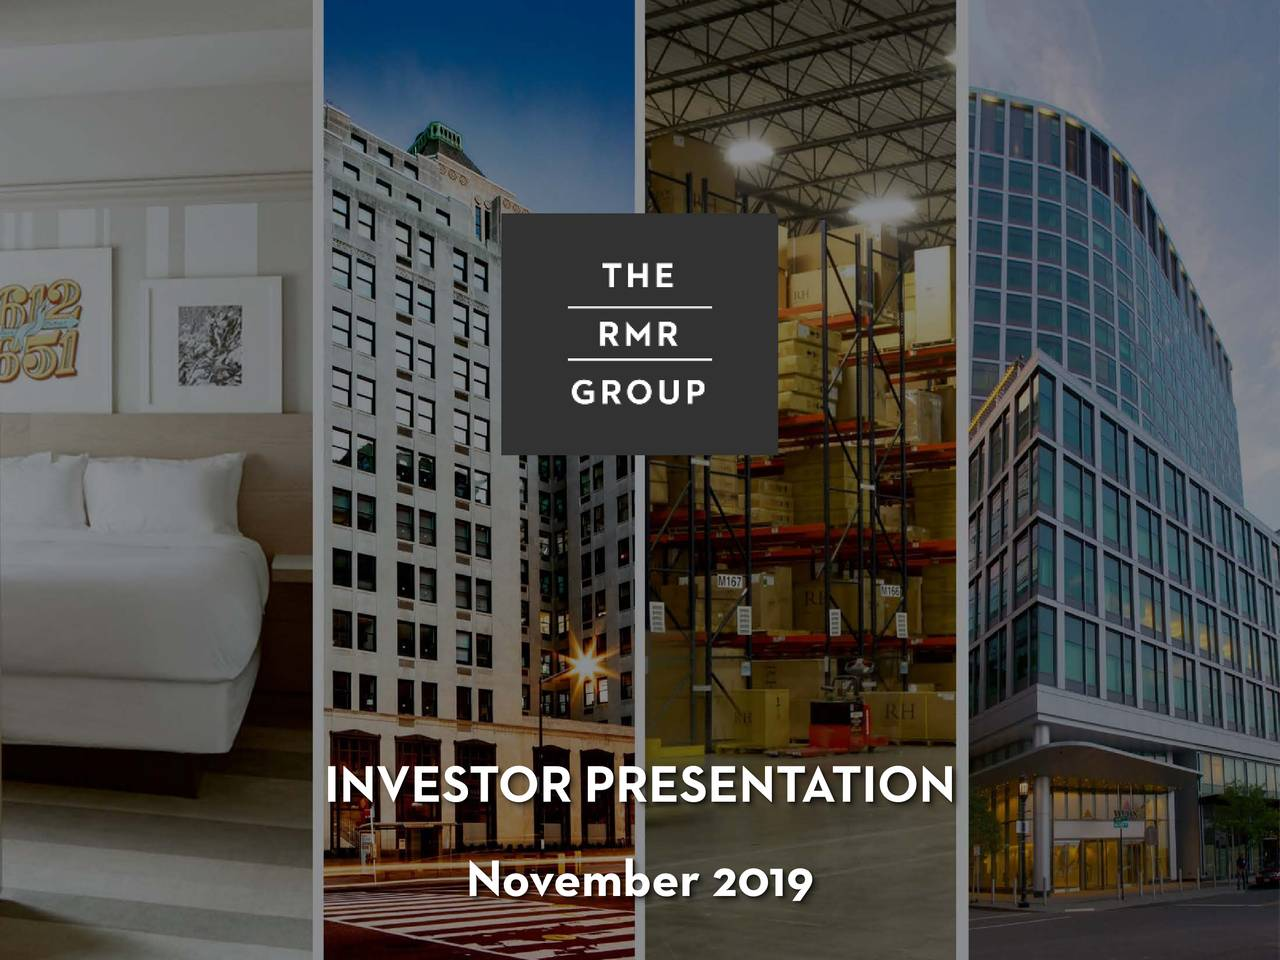 The RMR Group Inc. 2019 Q4 - Results - Earnings Call Presentation - The RMR Group Inc. (NASDAQ:RMR) | Seeking Alpha